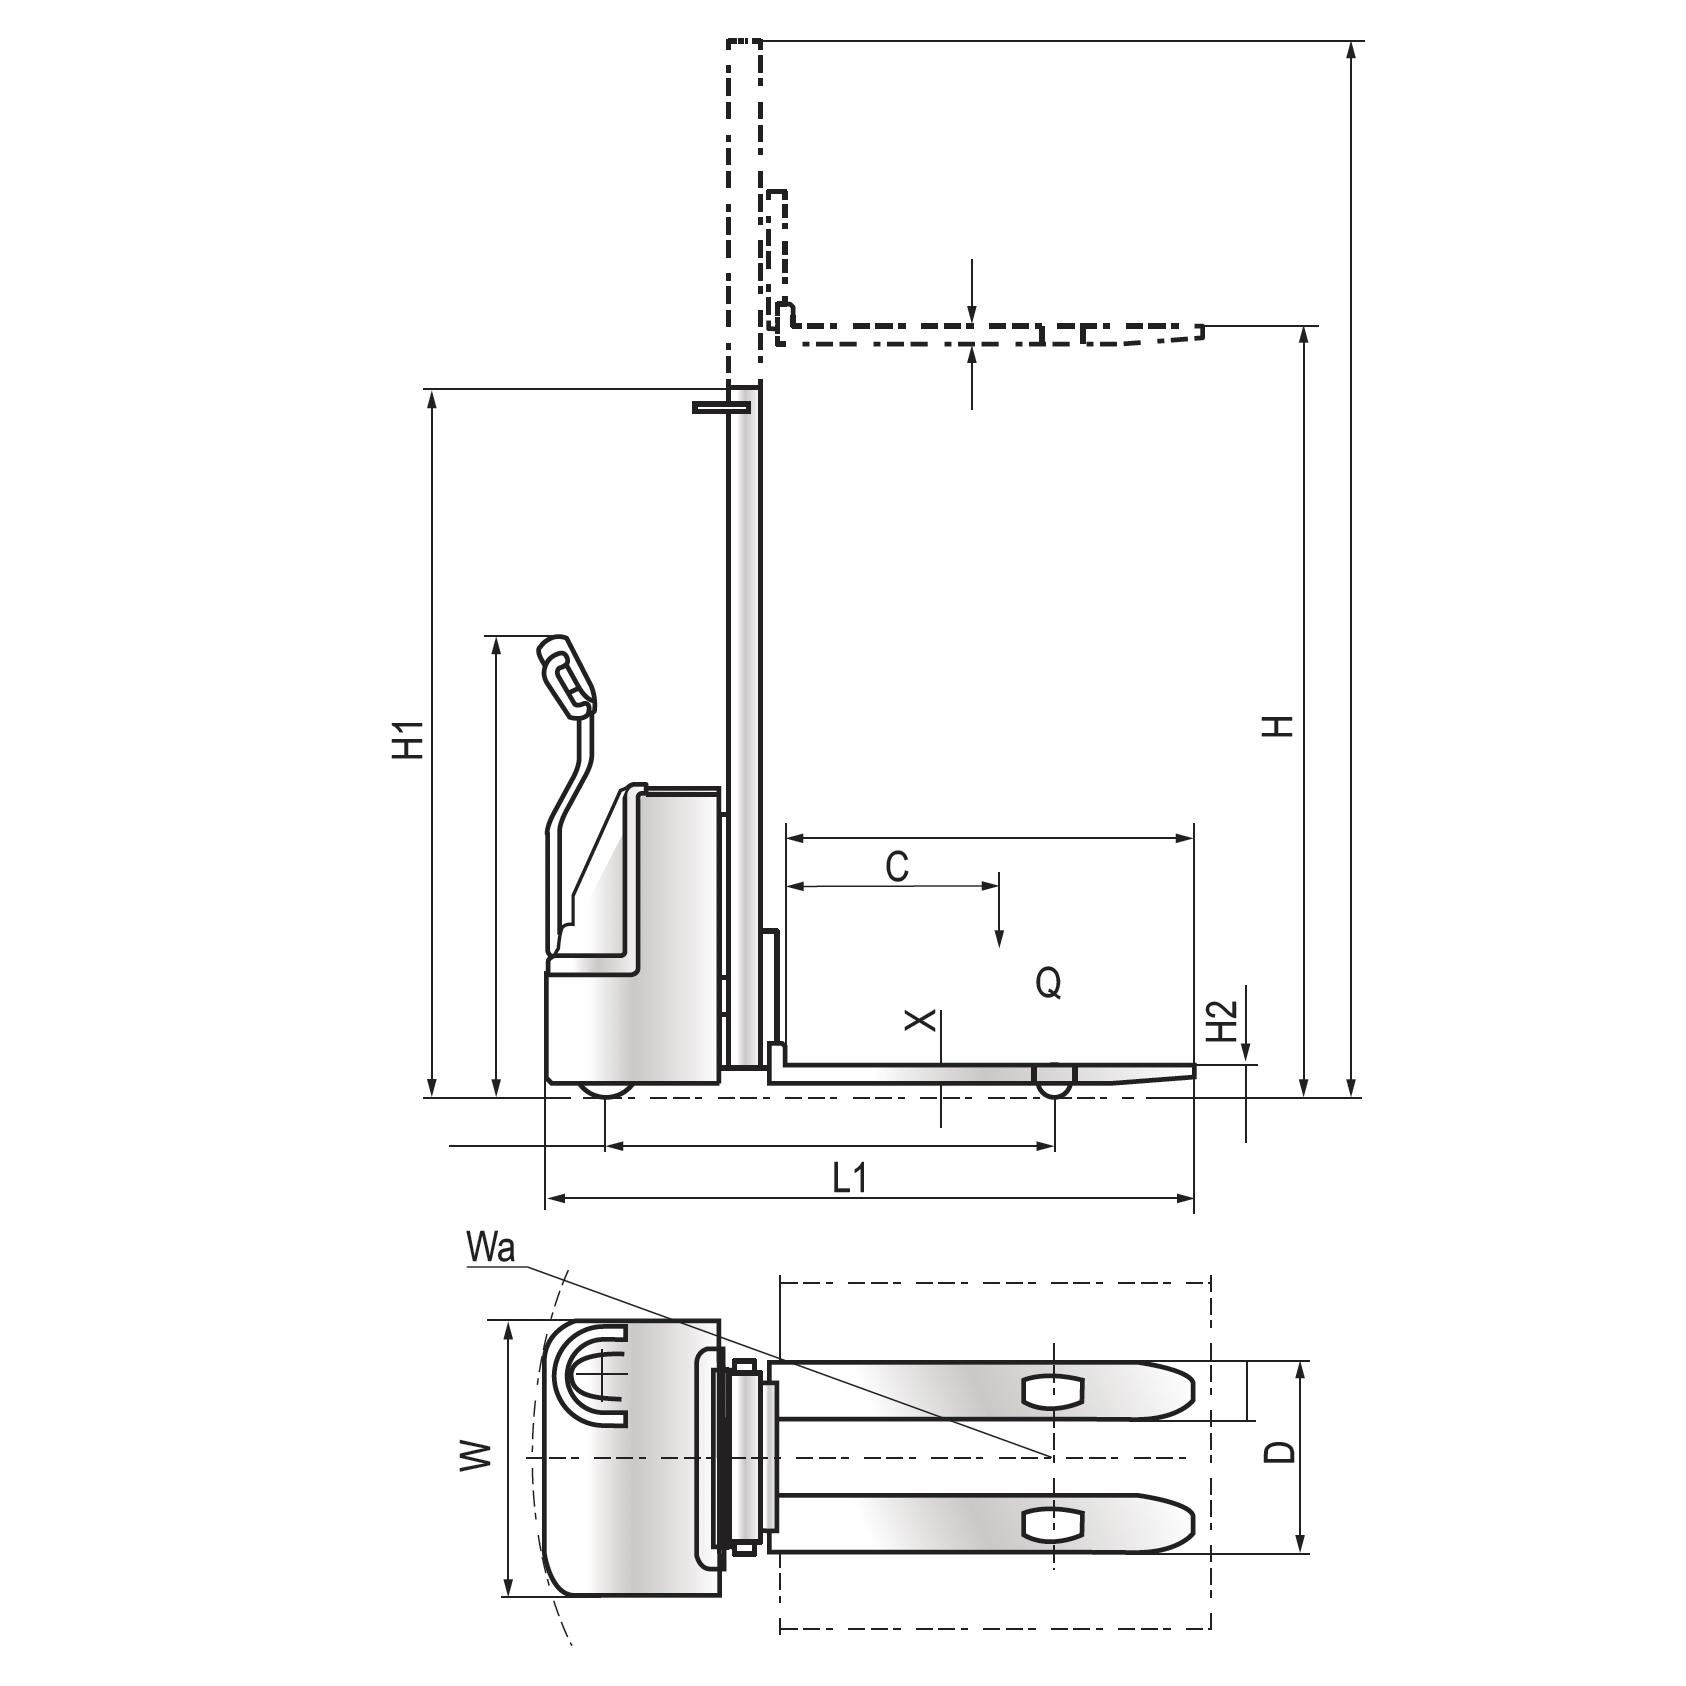 Transpallet sollevatore elettrico per pallet 1600mm 1500kg - MA SL EL16